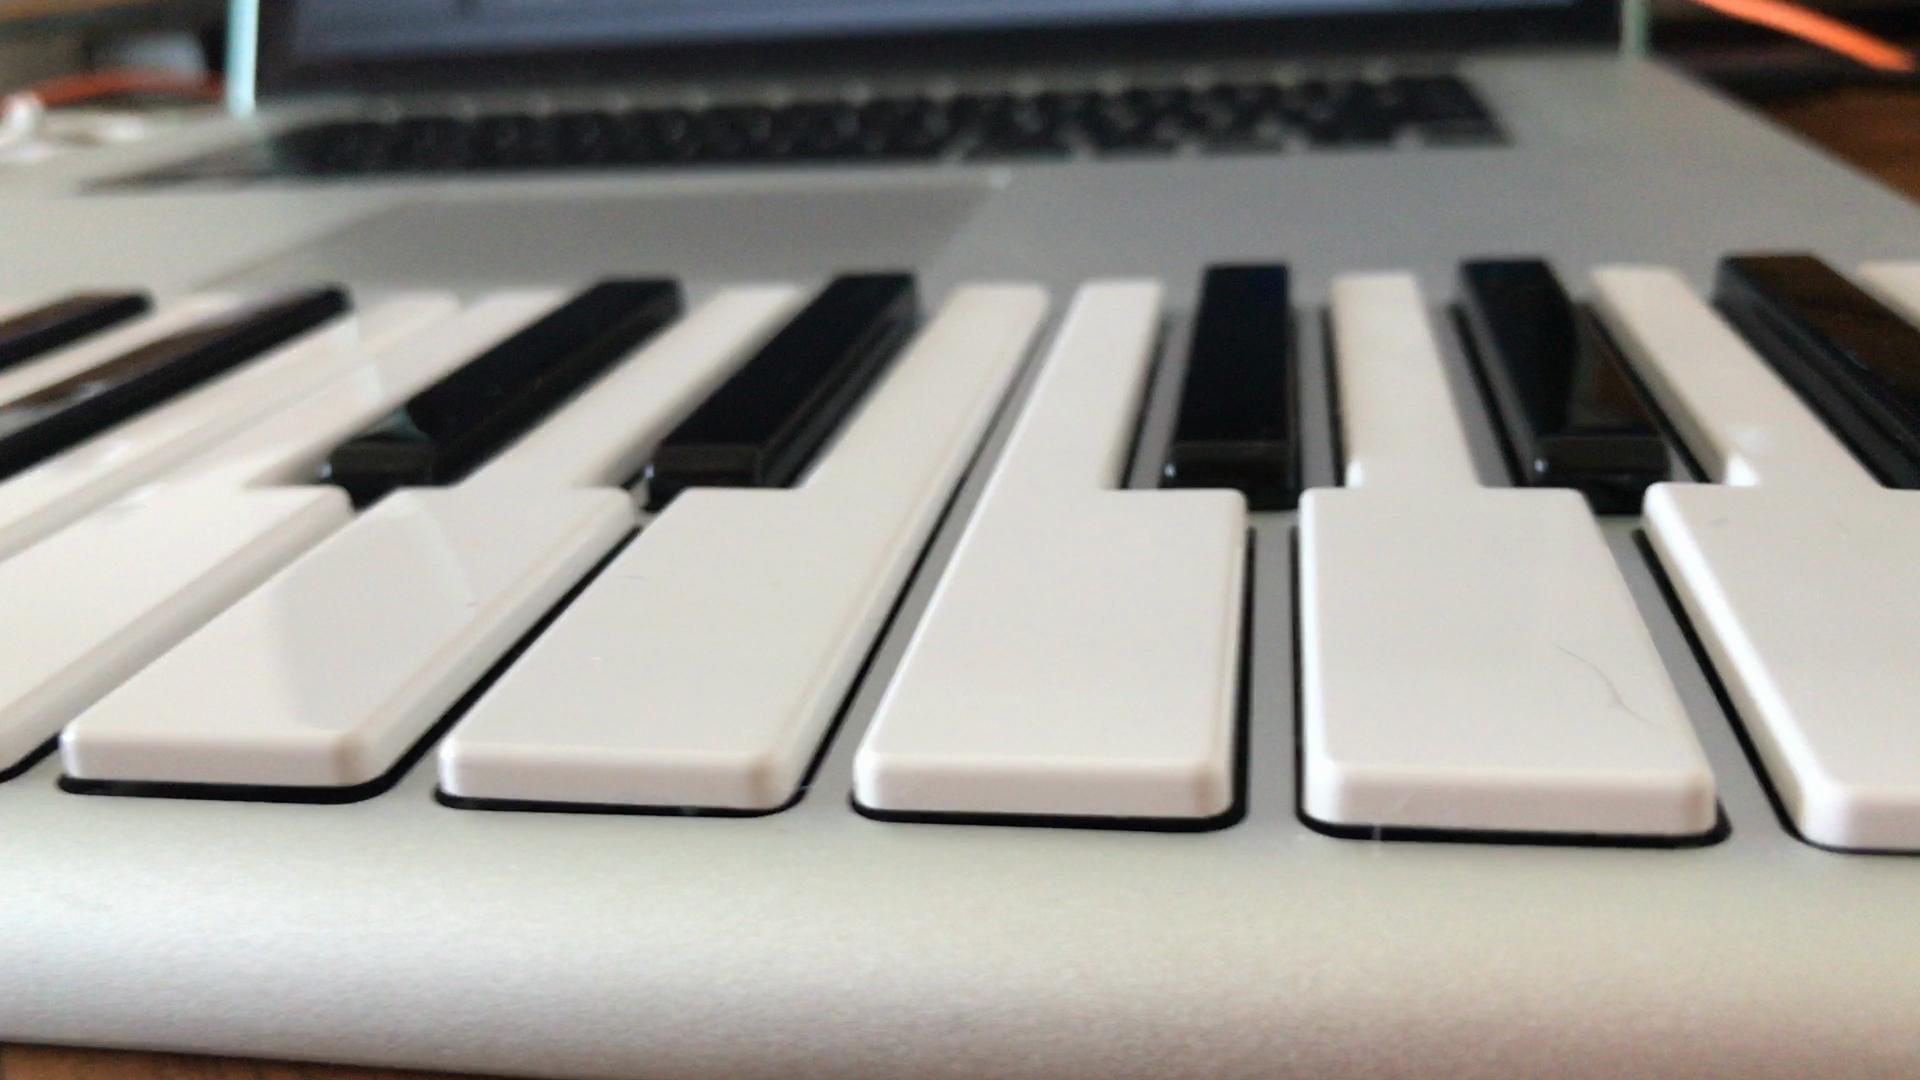 xkey 25 key portable musical keyboard musical instruments